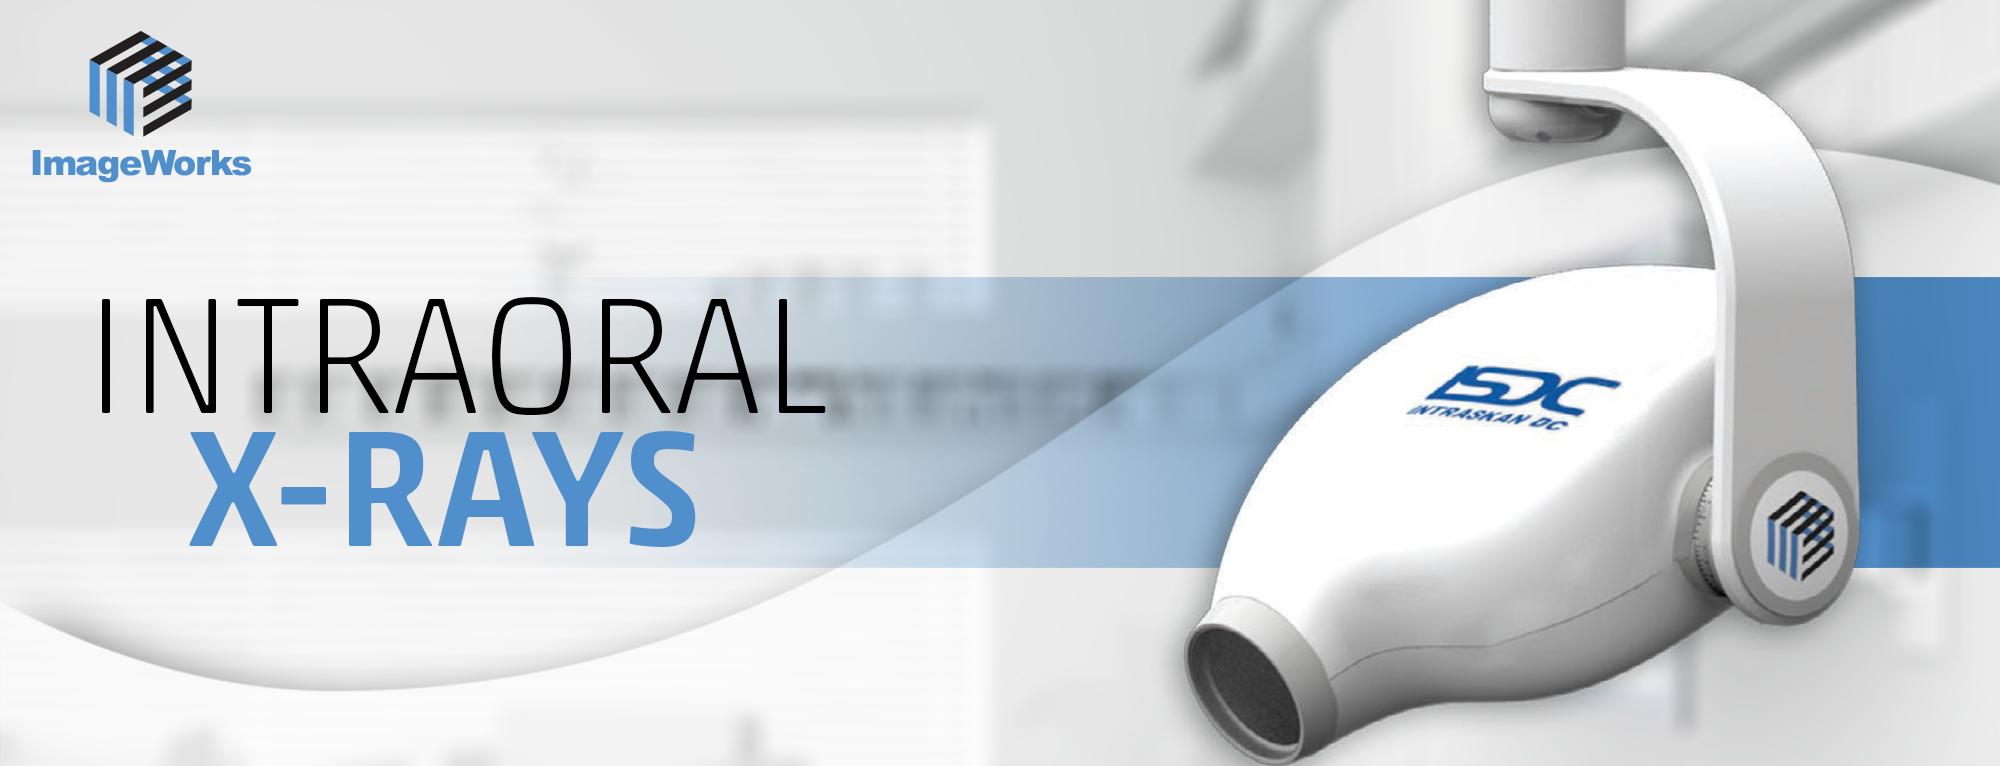 Intraoral X-Rays